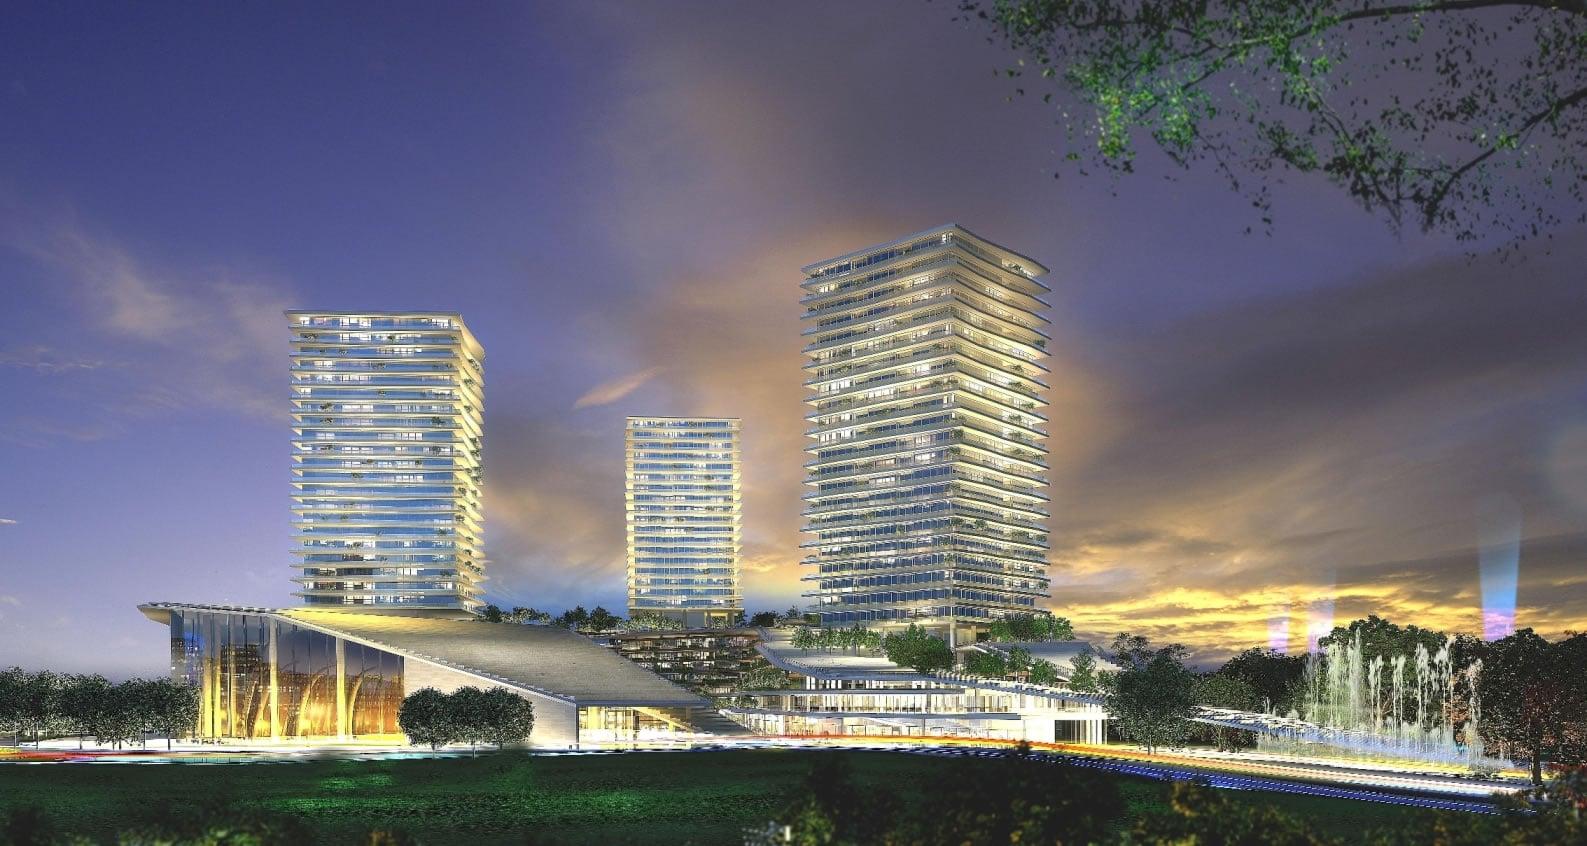 raffles istanbul ein neues 5 sterne hotel am bosphorus. Black Bedroom Furniture Sets. Home Design Ideas